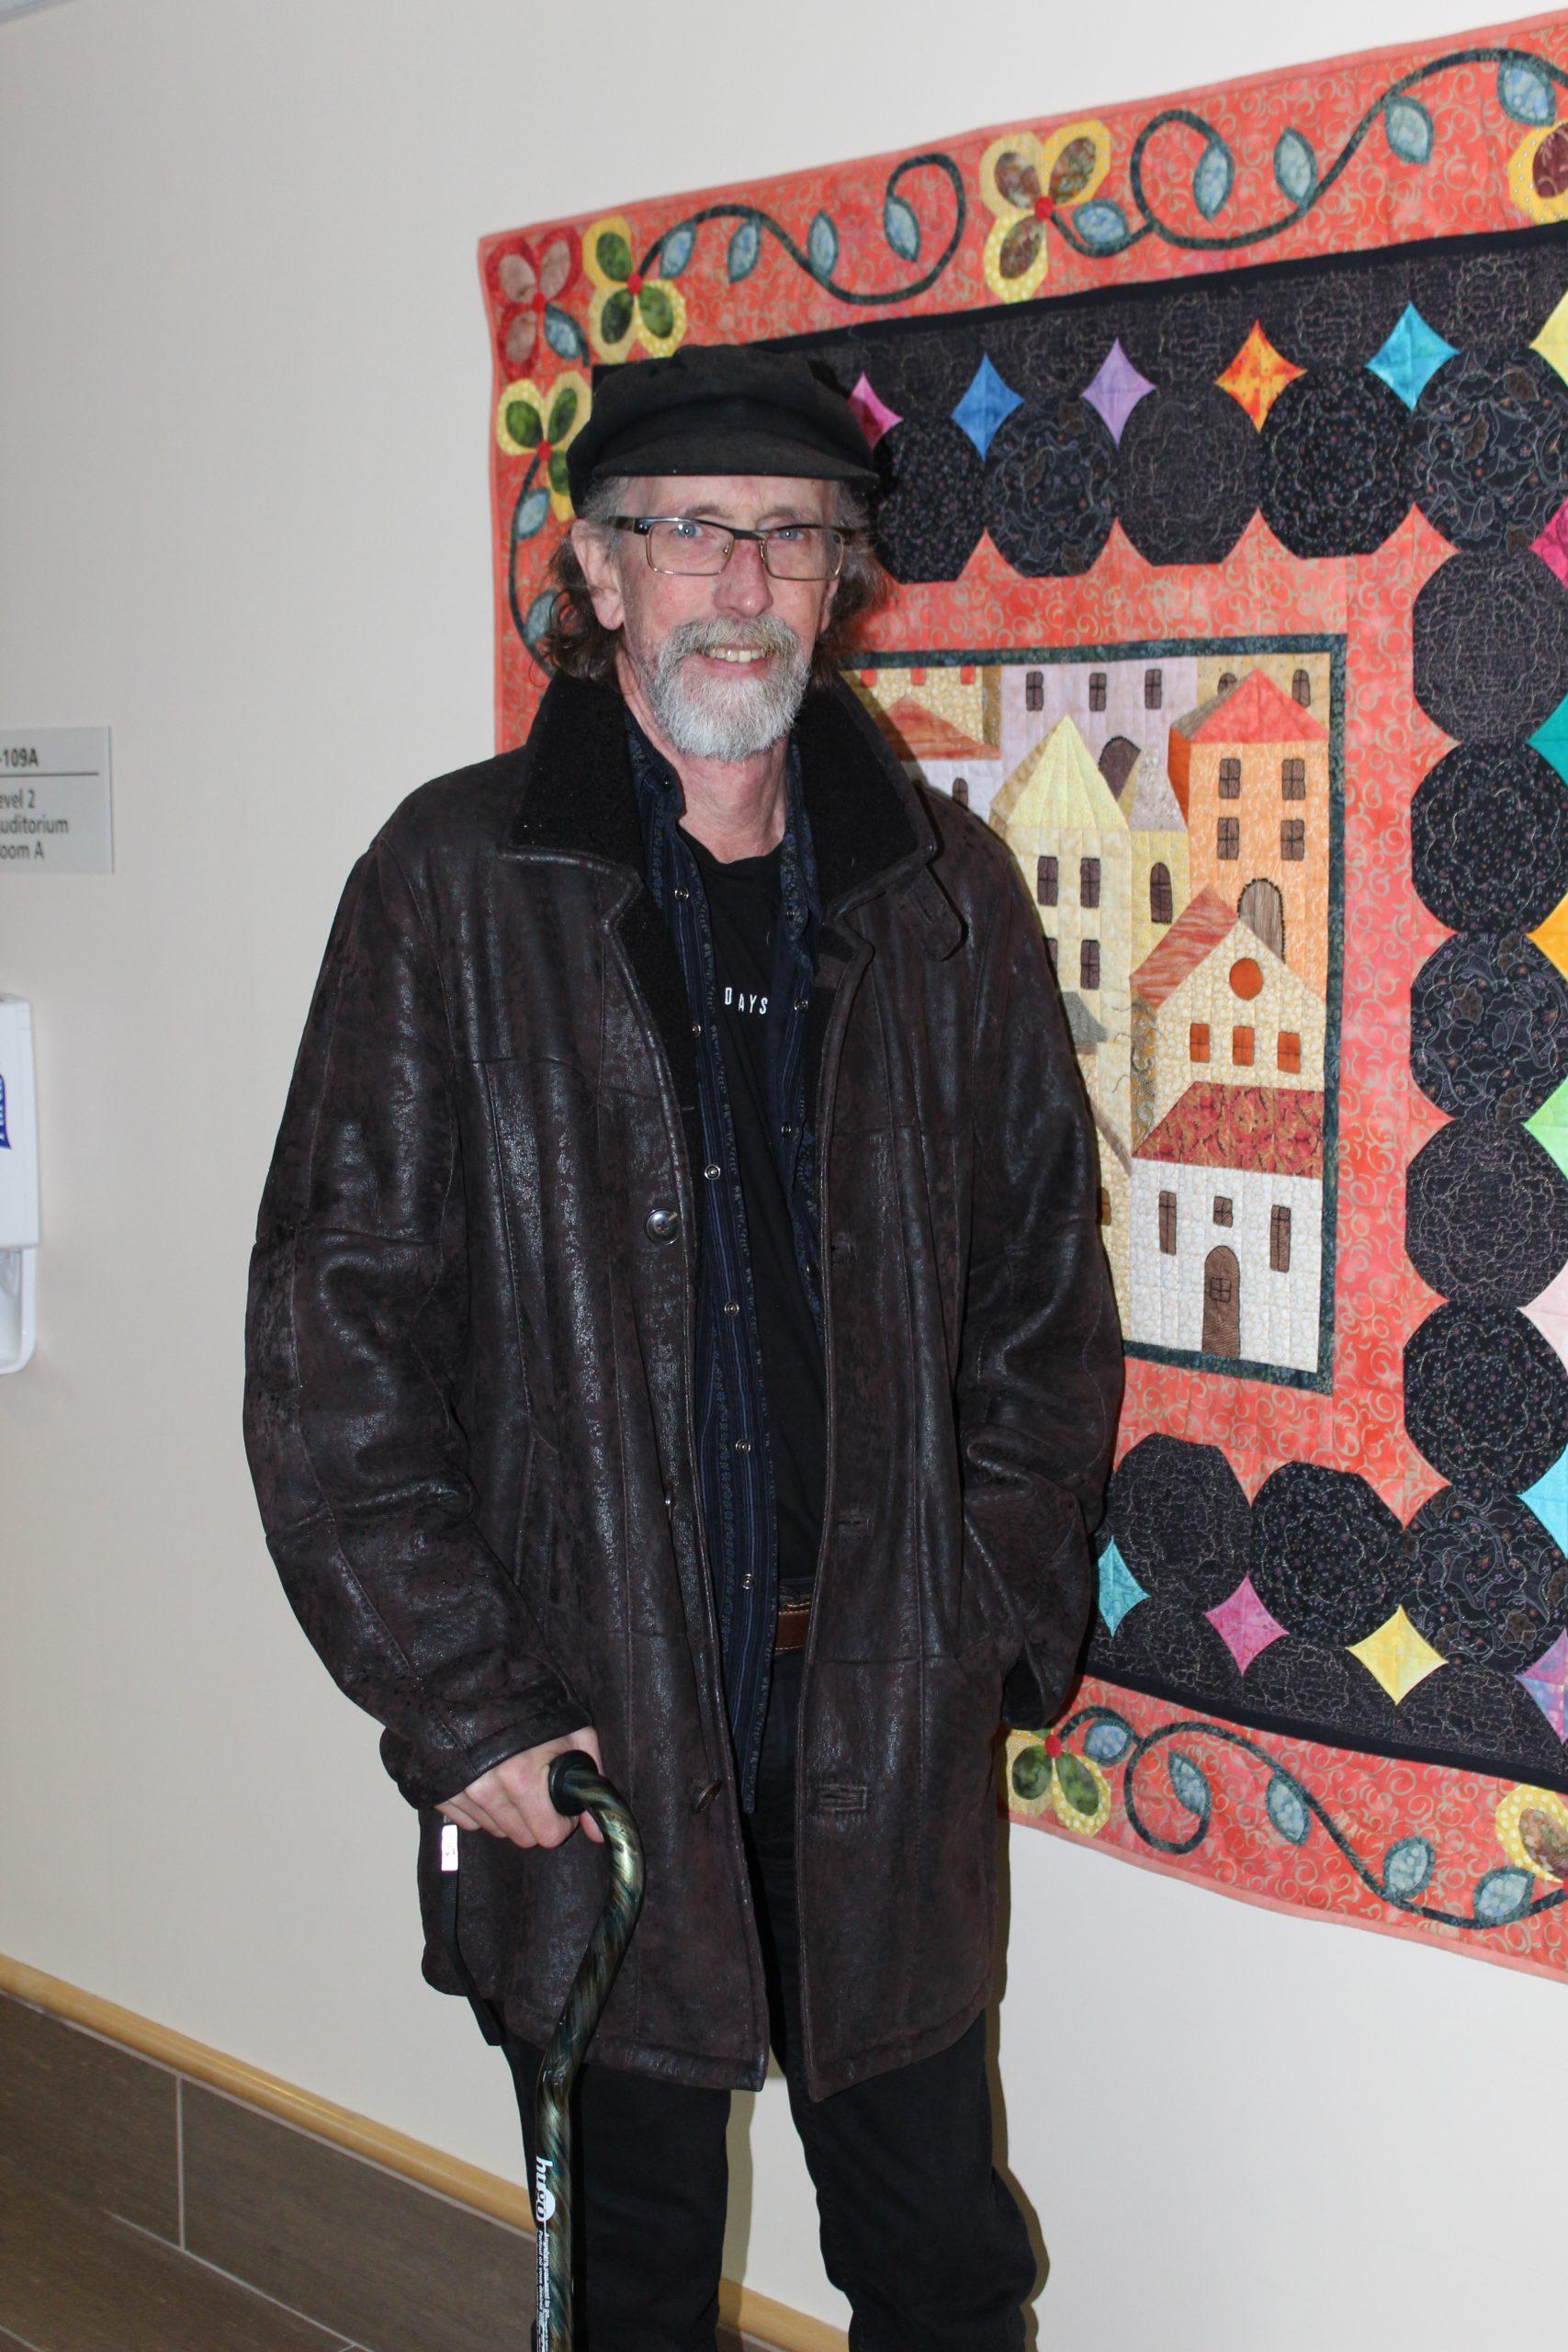 Image of Bill standing at St. Joseph's